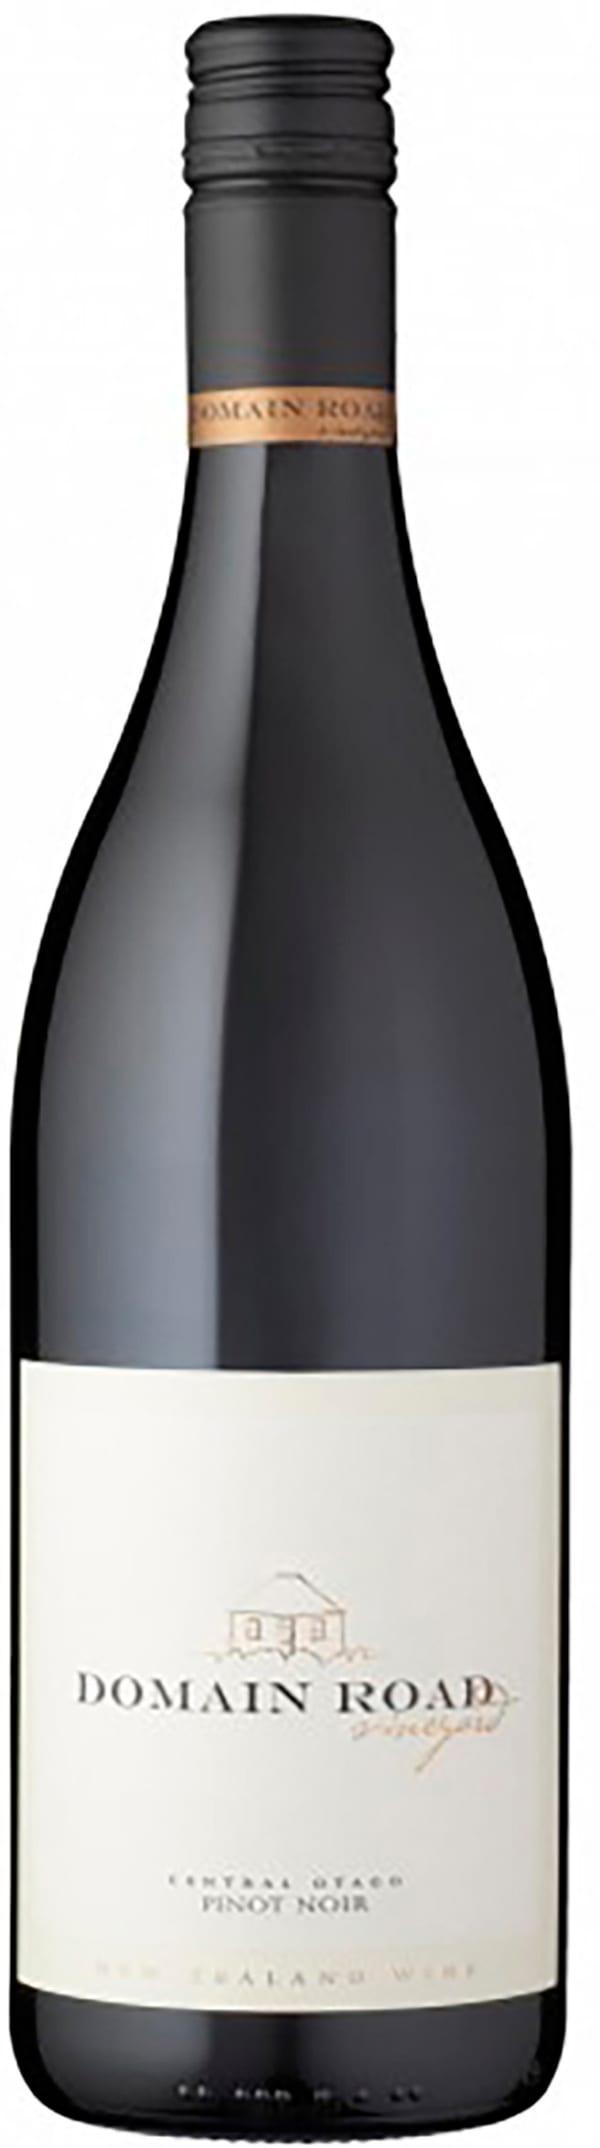 Domain Road Bannockburn Pinot Noir 2017